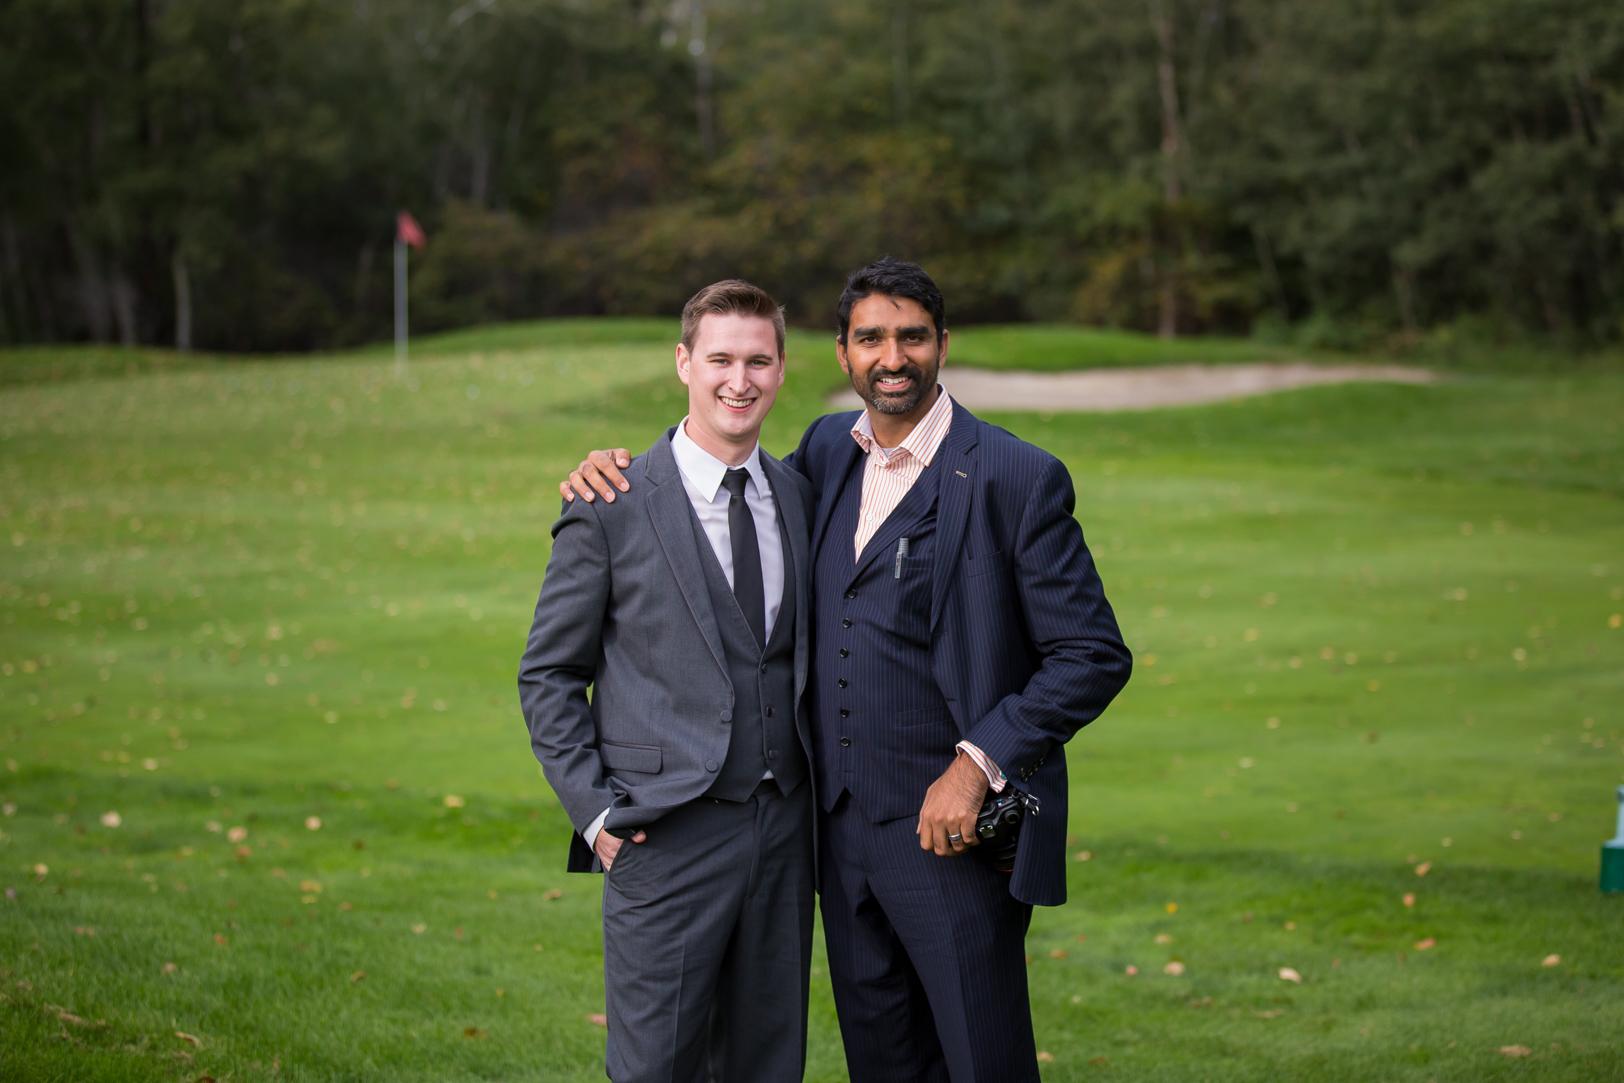 Fun Wedding Photos with Photographer